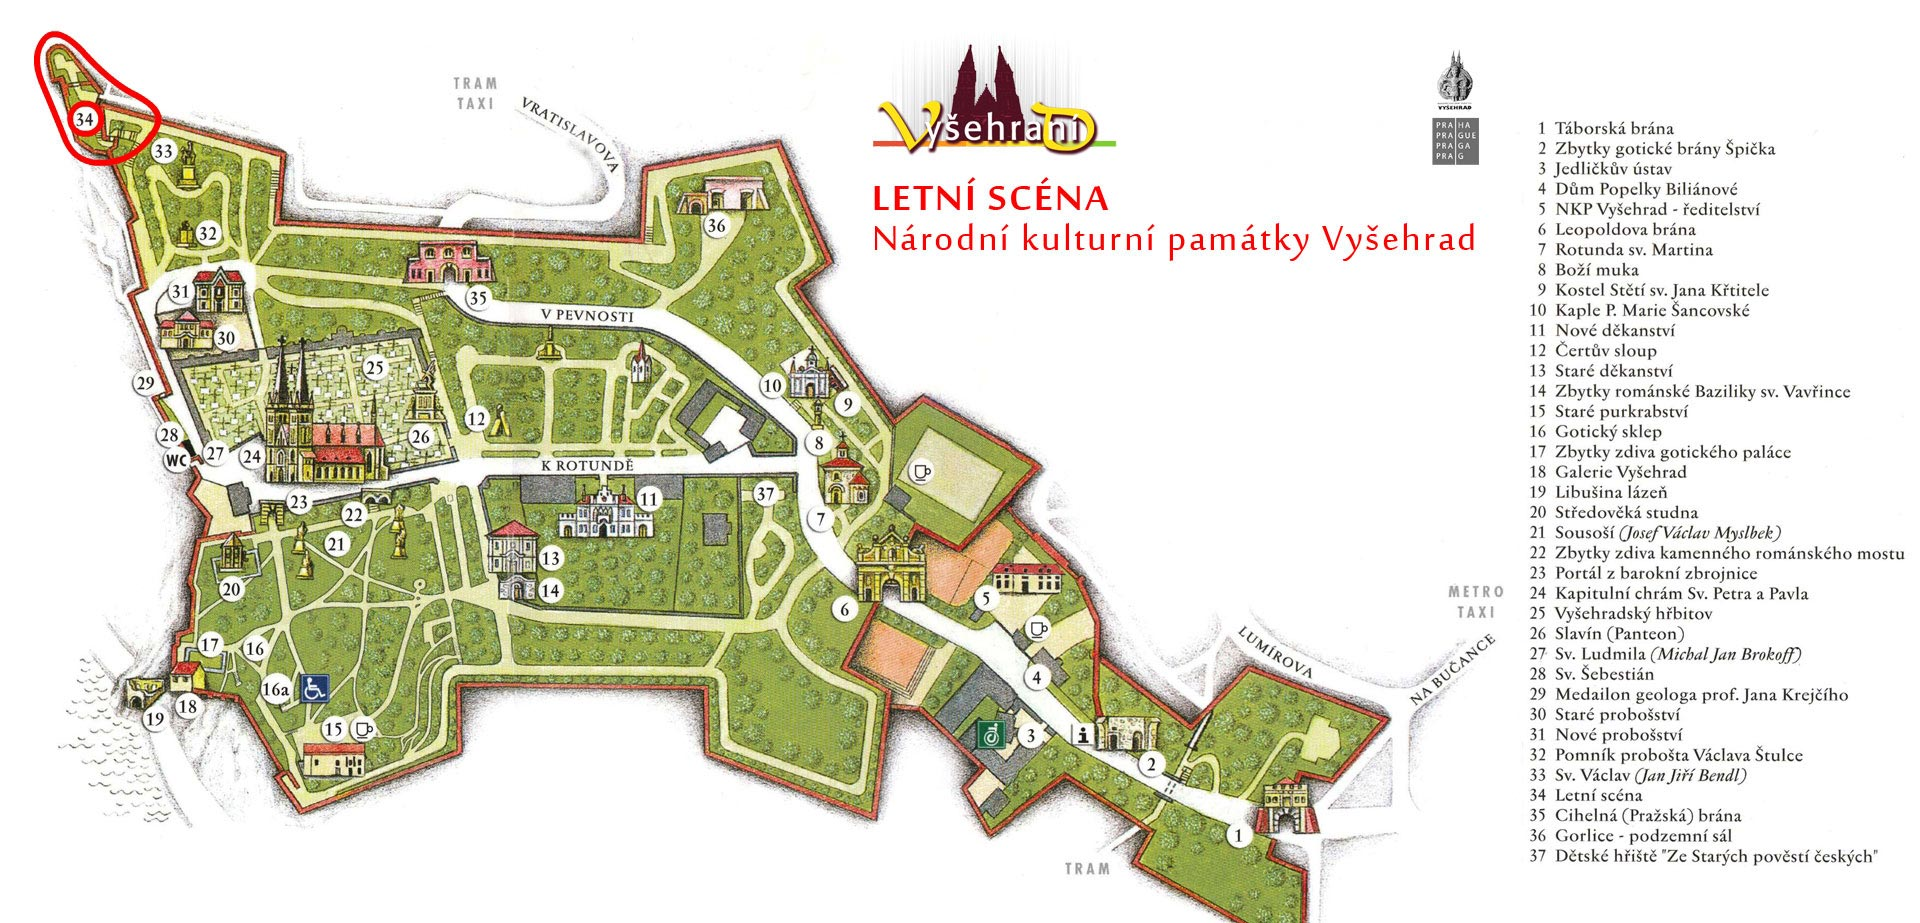 vysehrani_mapa_web